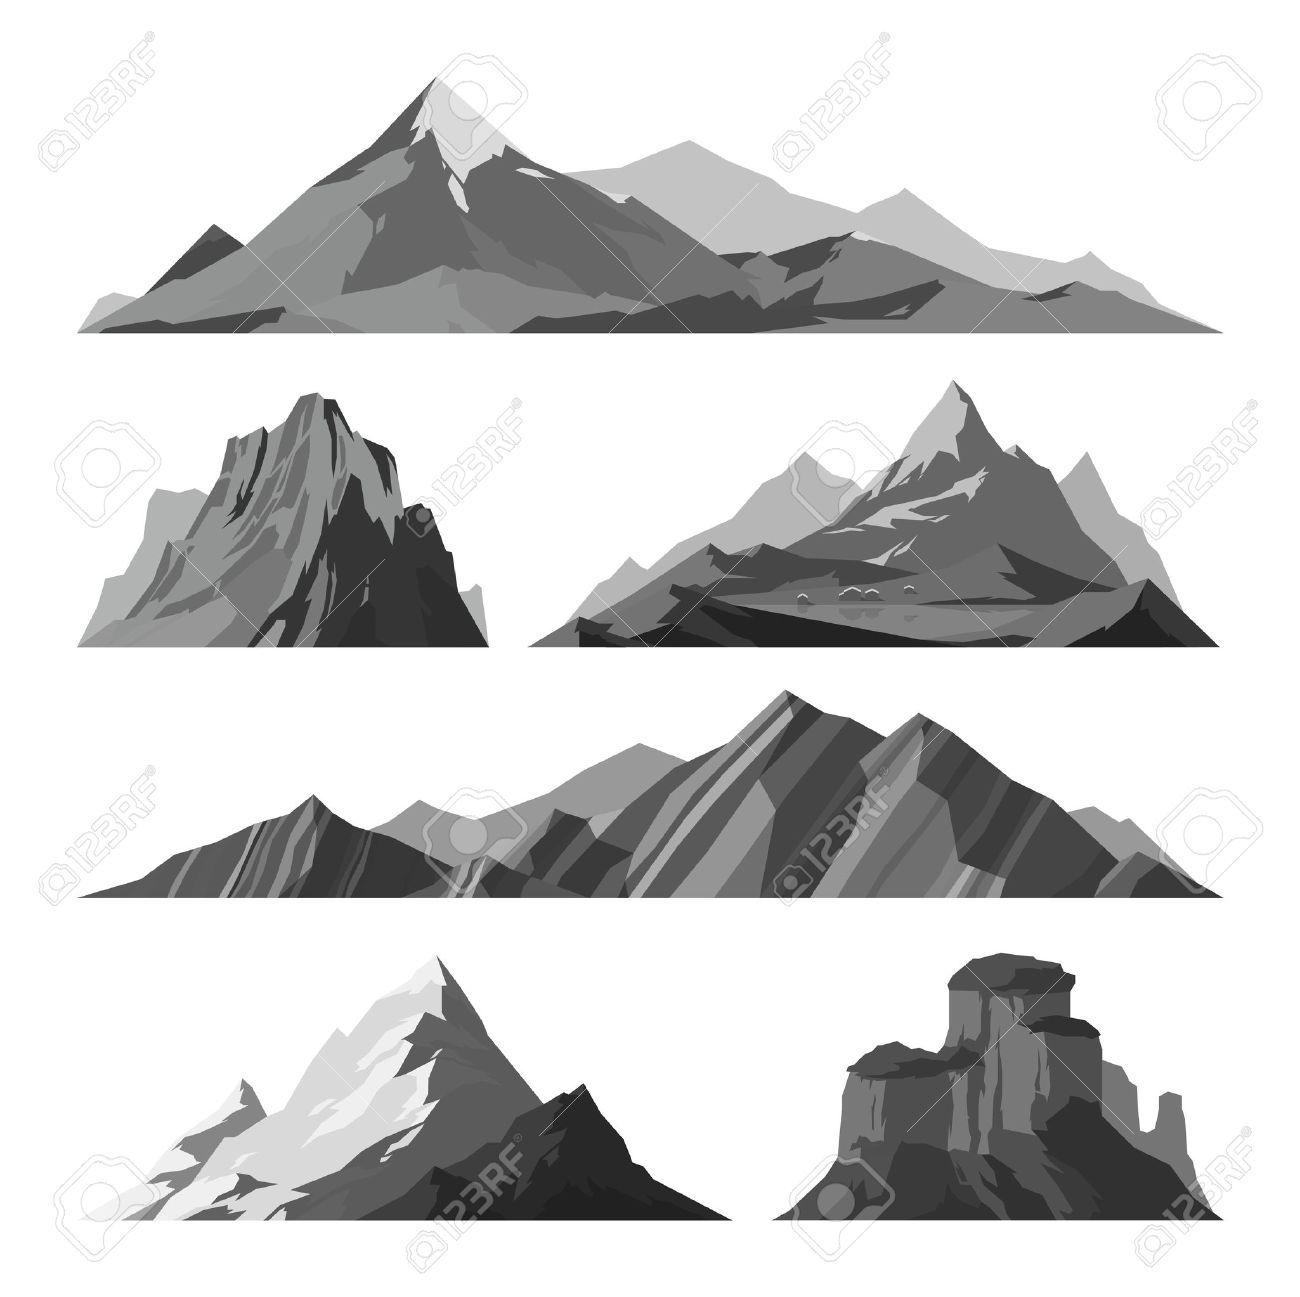 Ice Mountain Illustration Ocean Sun Stock Illustrations – 231 Ice Mountain  Illustration Ocean Sun Stock Illustrations, Vectors & Clipart - Dreamstime